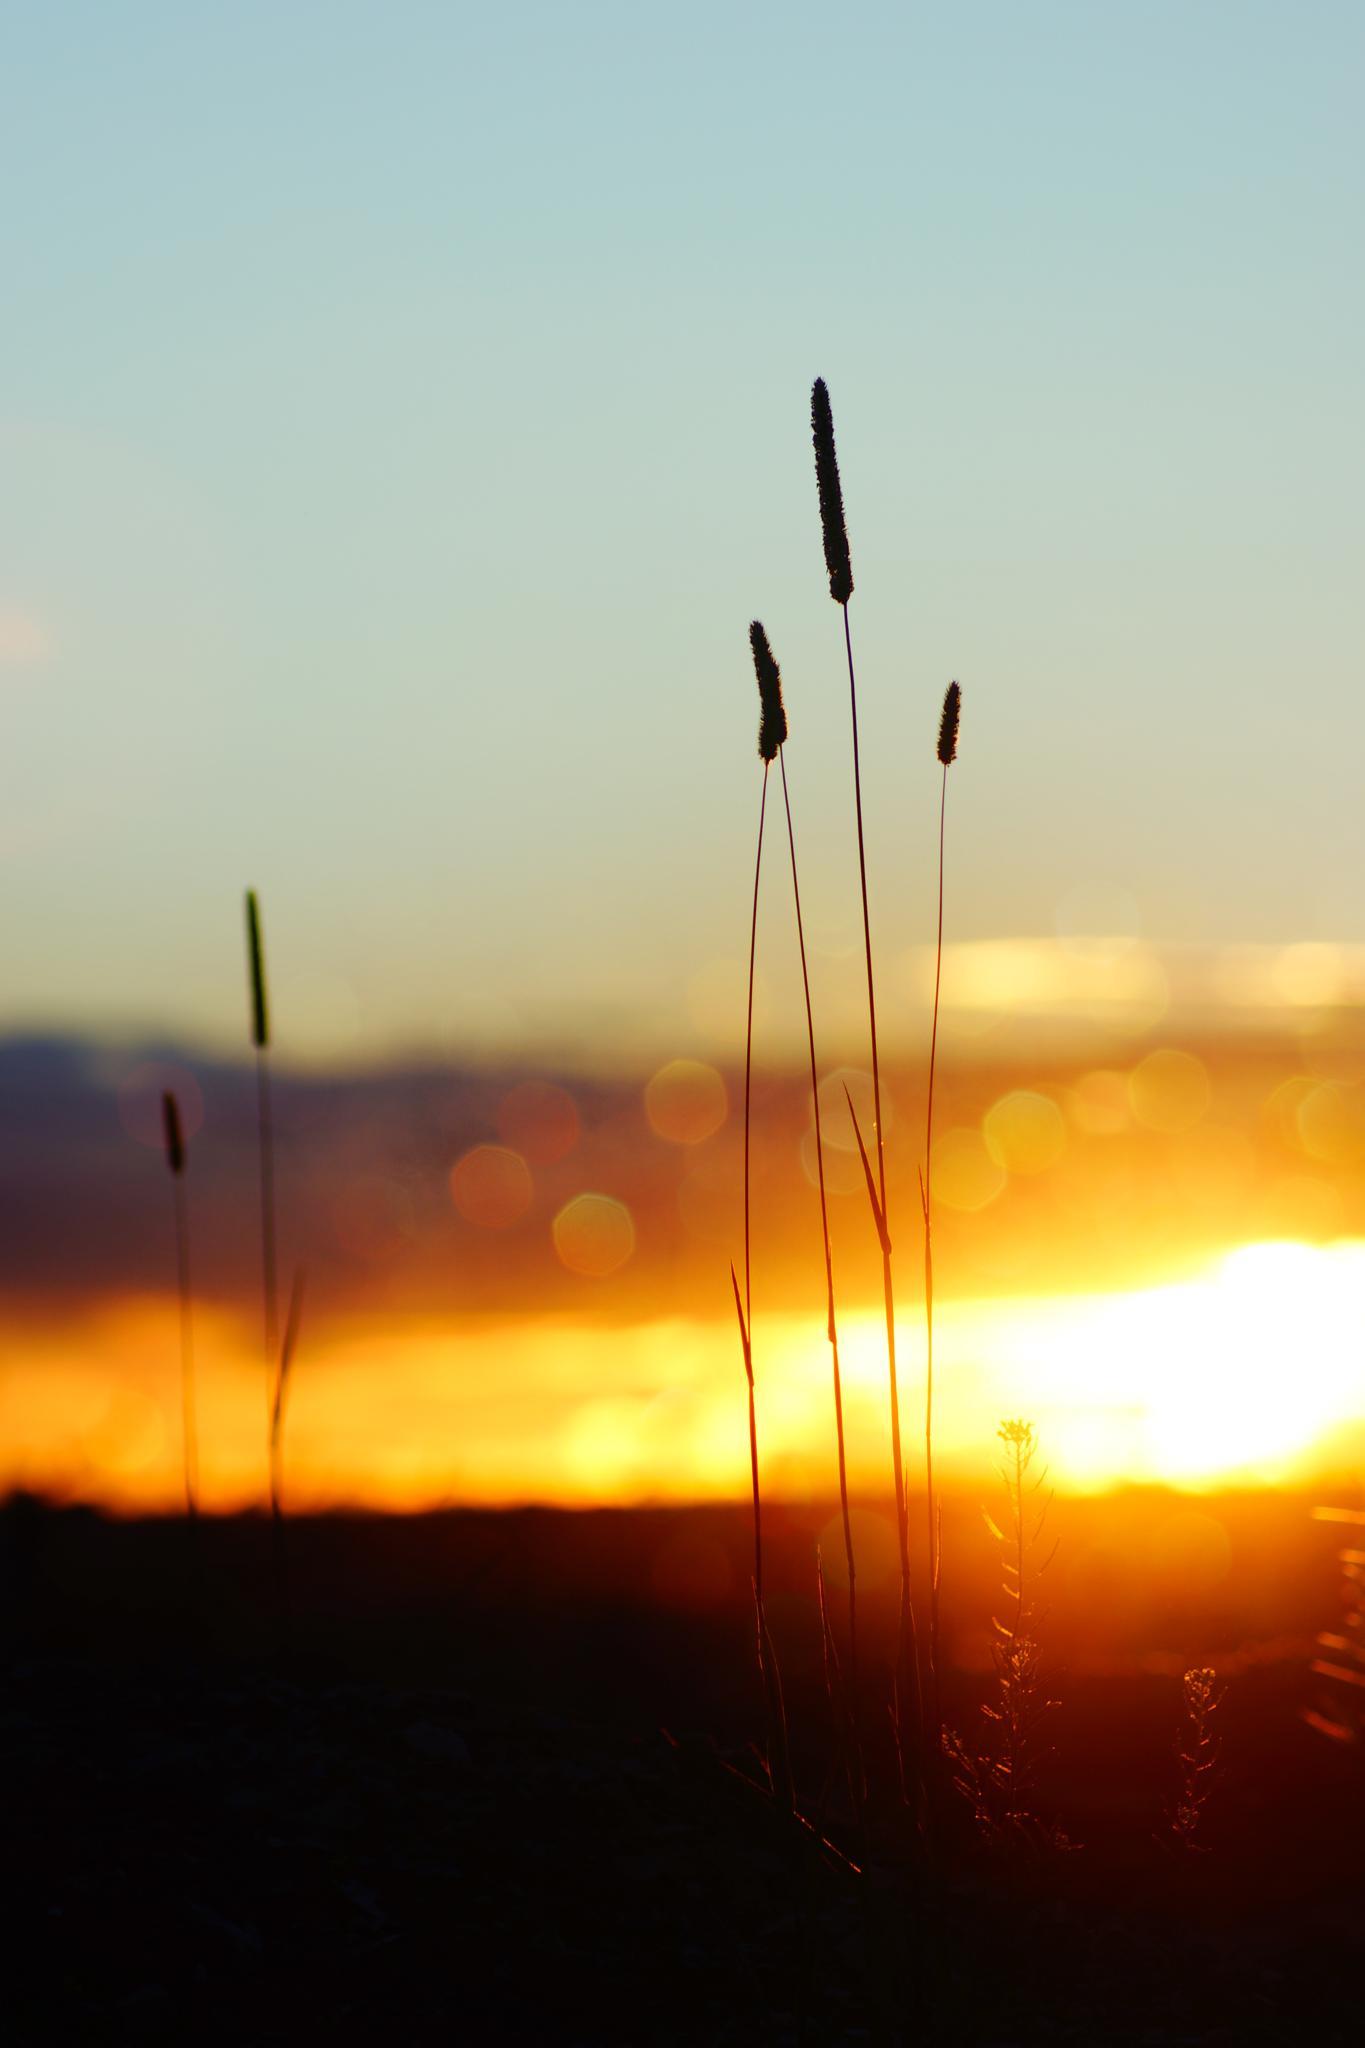 Sunset, bokeh light by sylviecorriveau